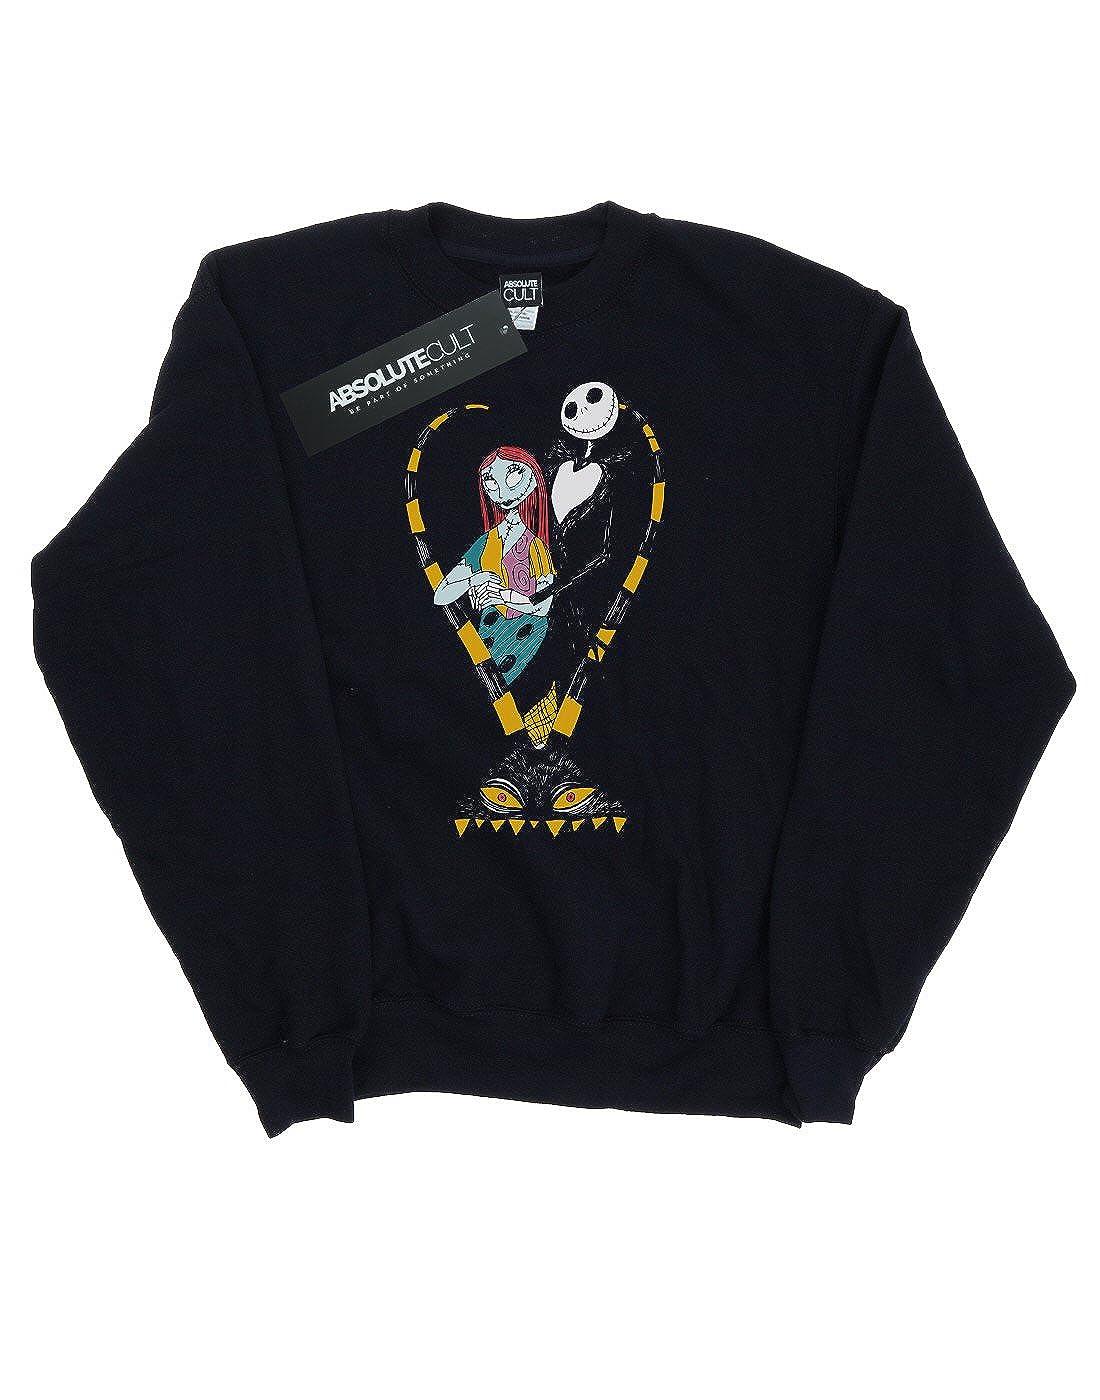 Disney Womens Nightmare Before Christmas Jack and Sally Love Sweatshirt